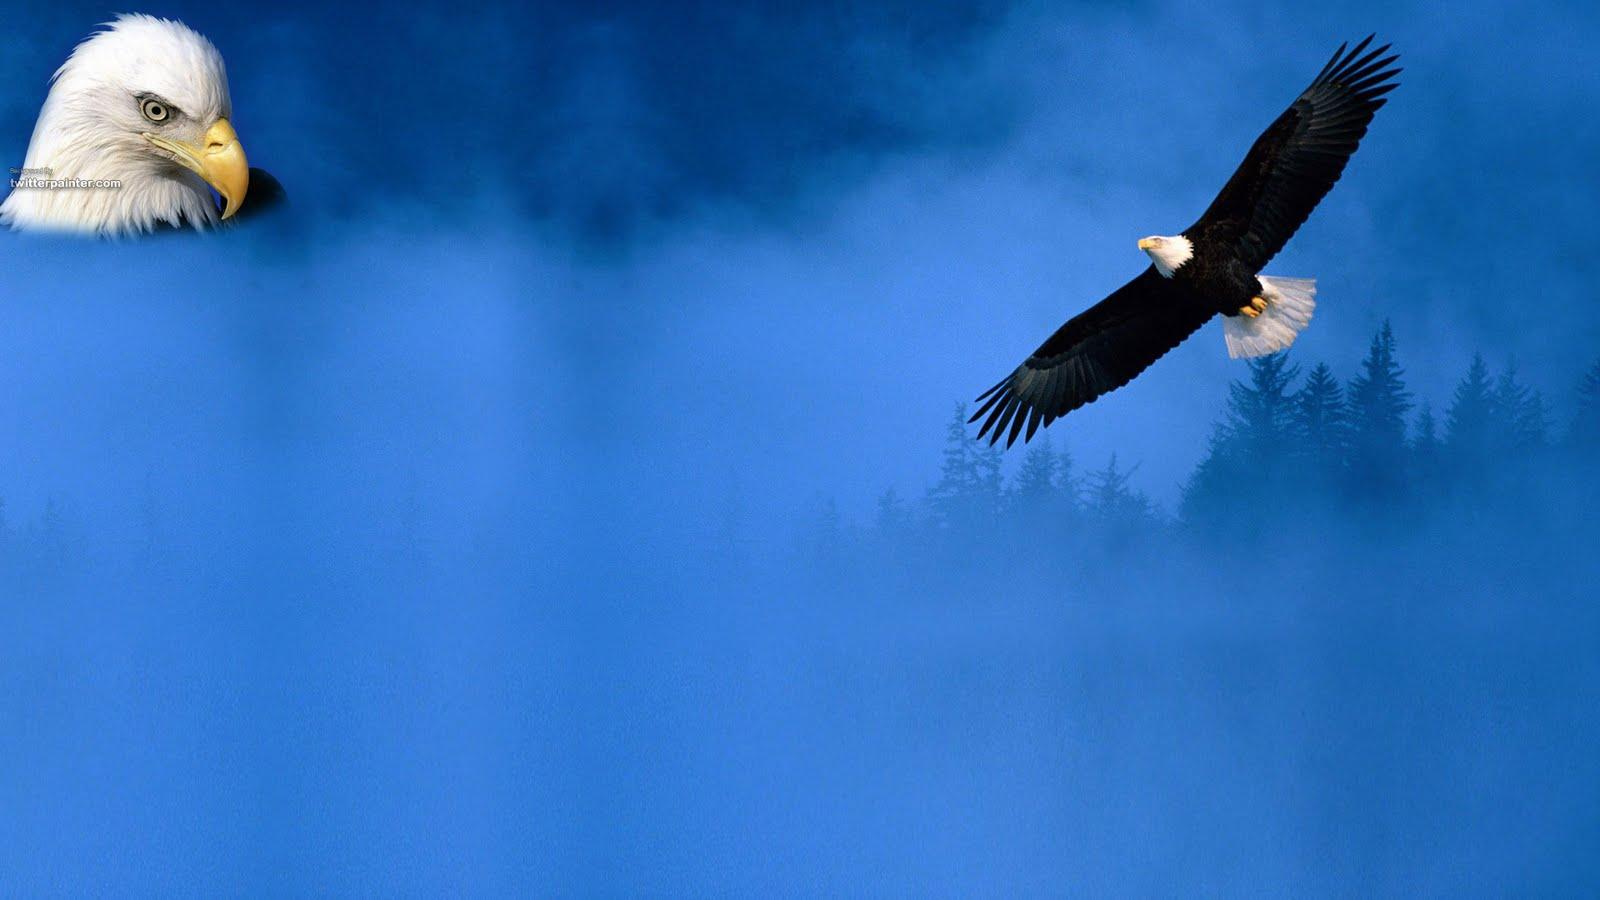 My Background Blog Eagle Backgrounds